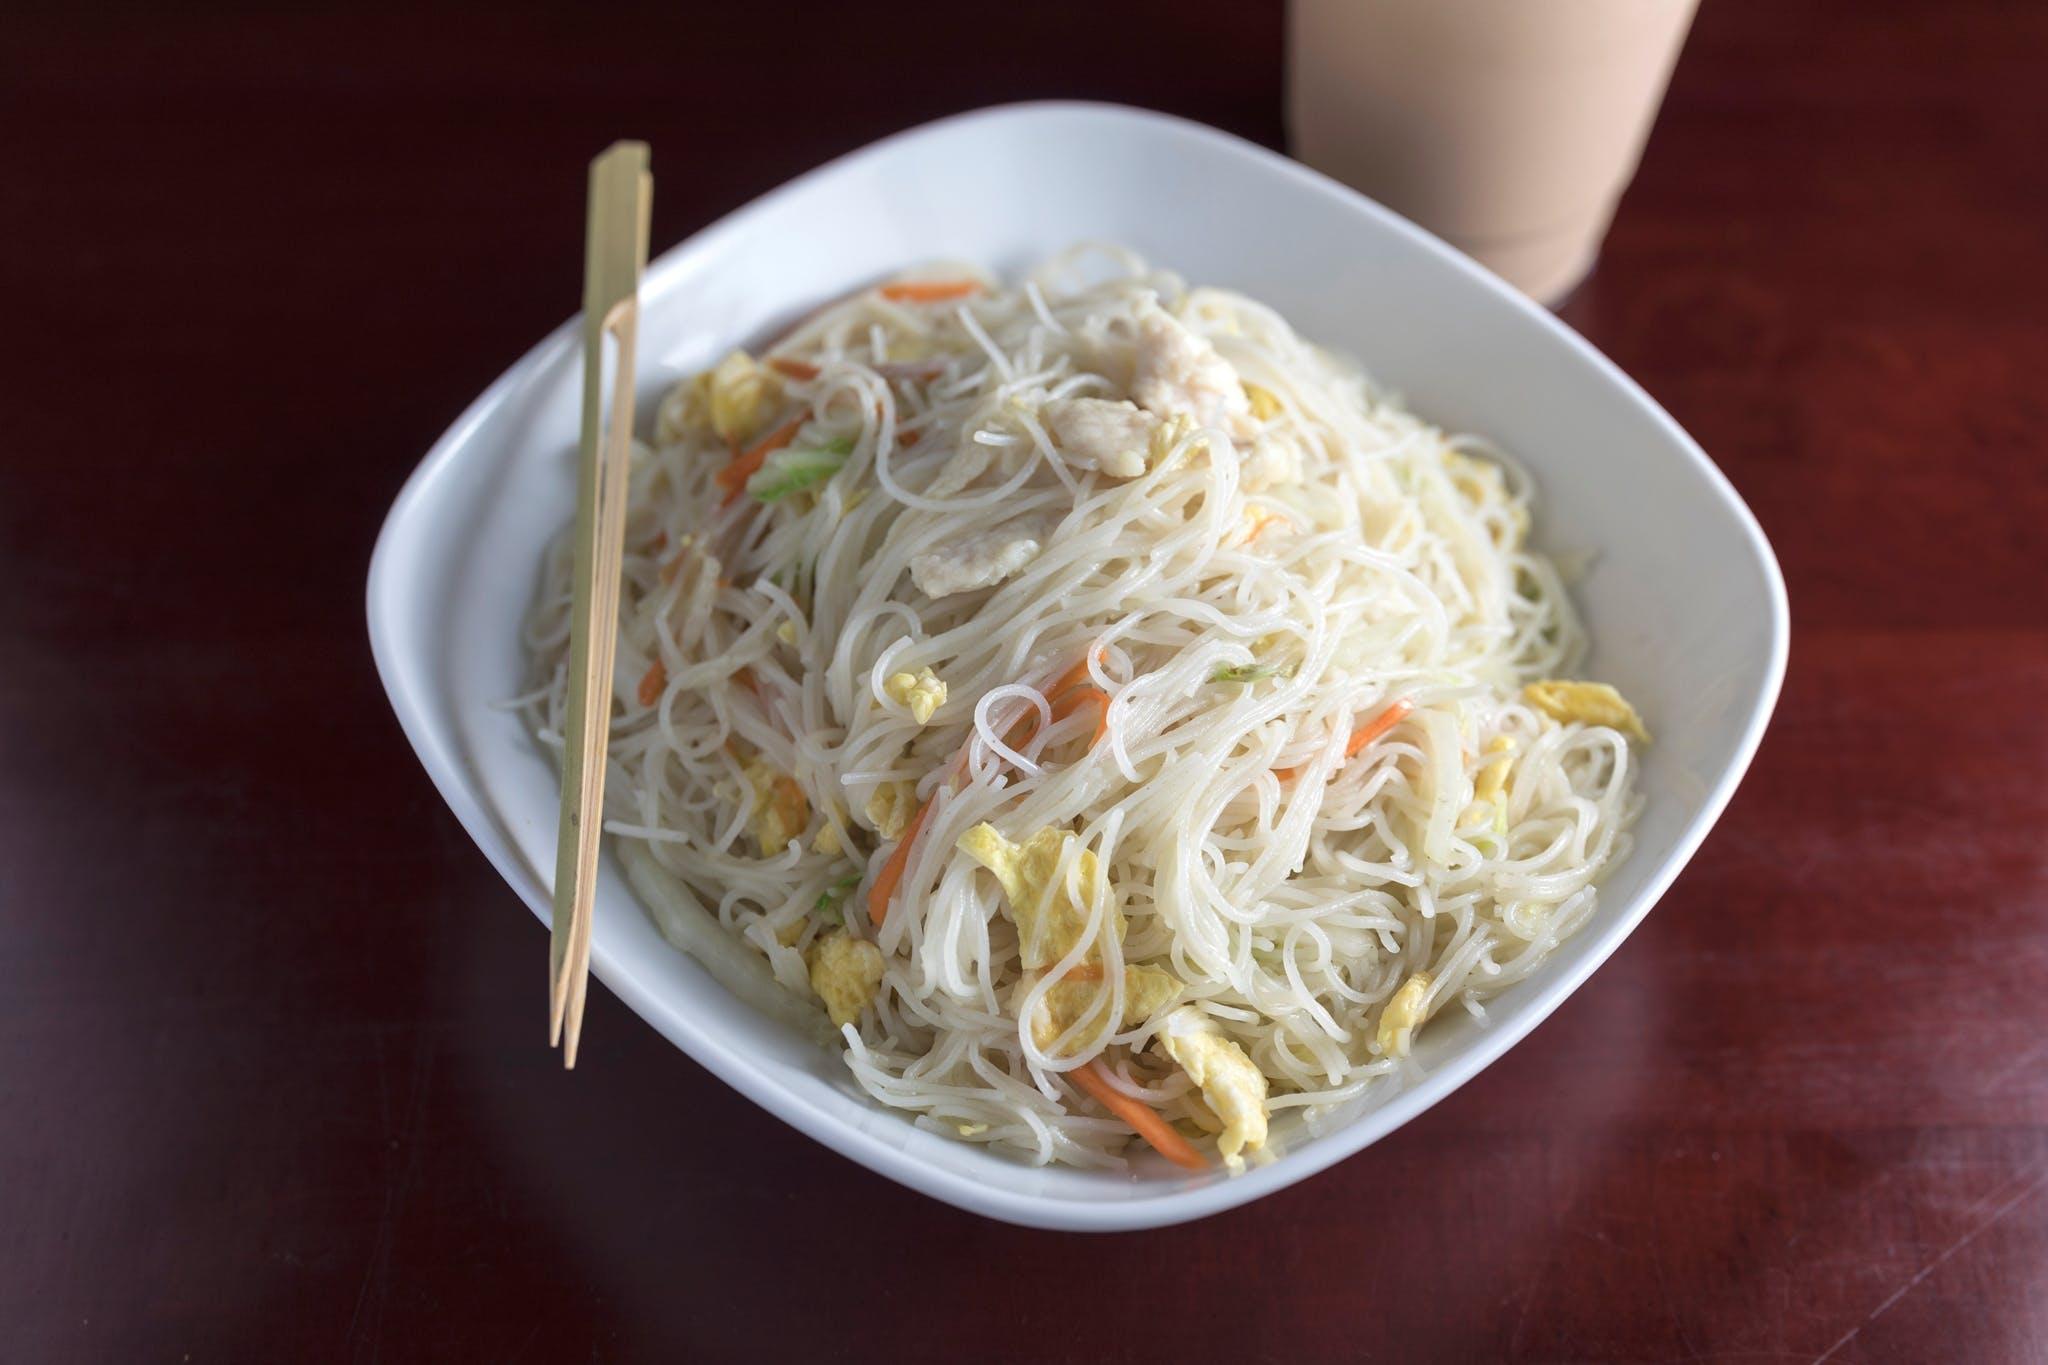 Curry Mi Fen from Jade Dragon Restaurant in Oshkosh, WI